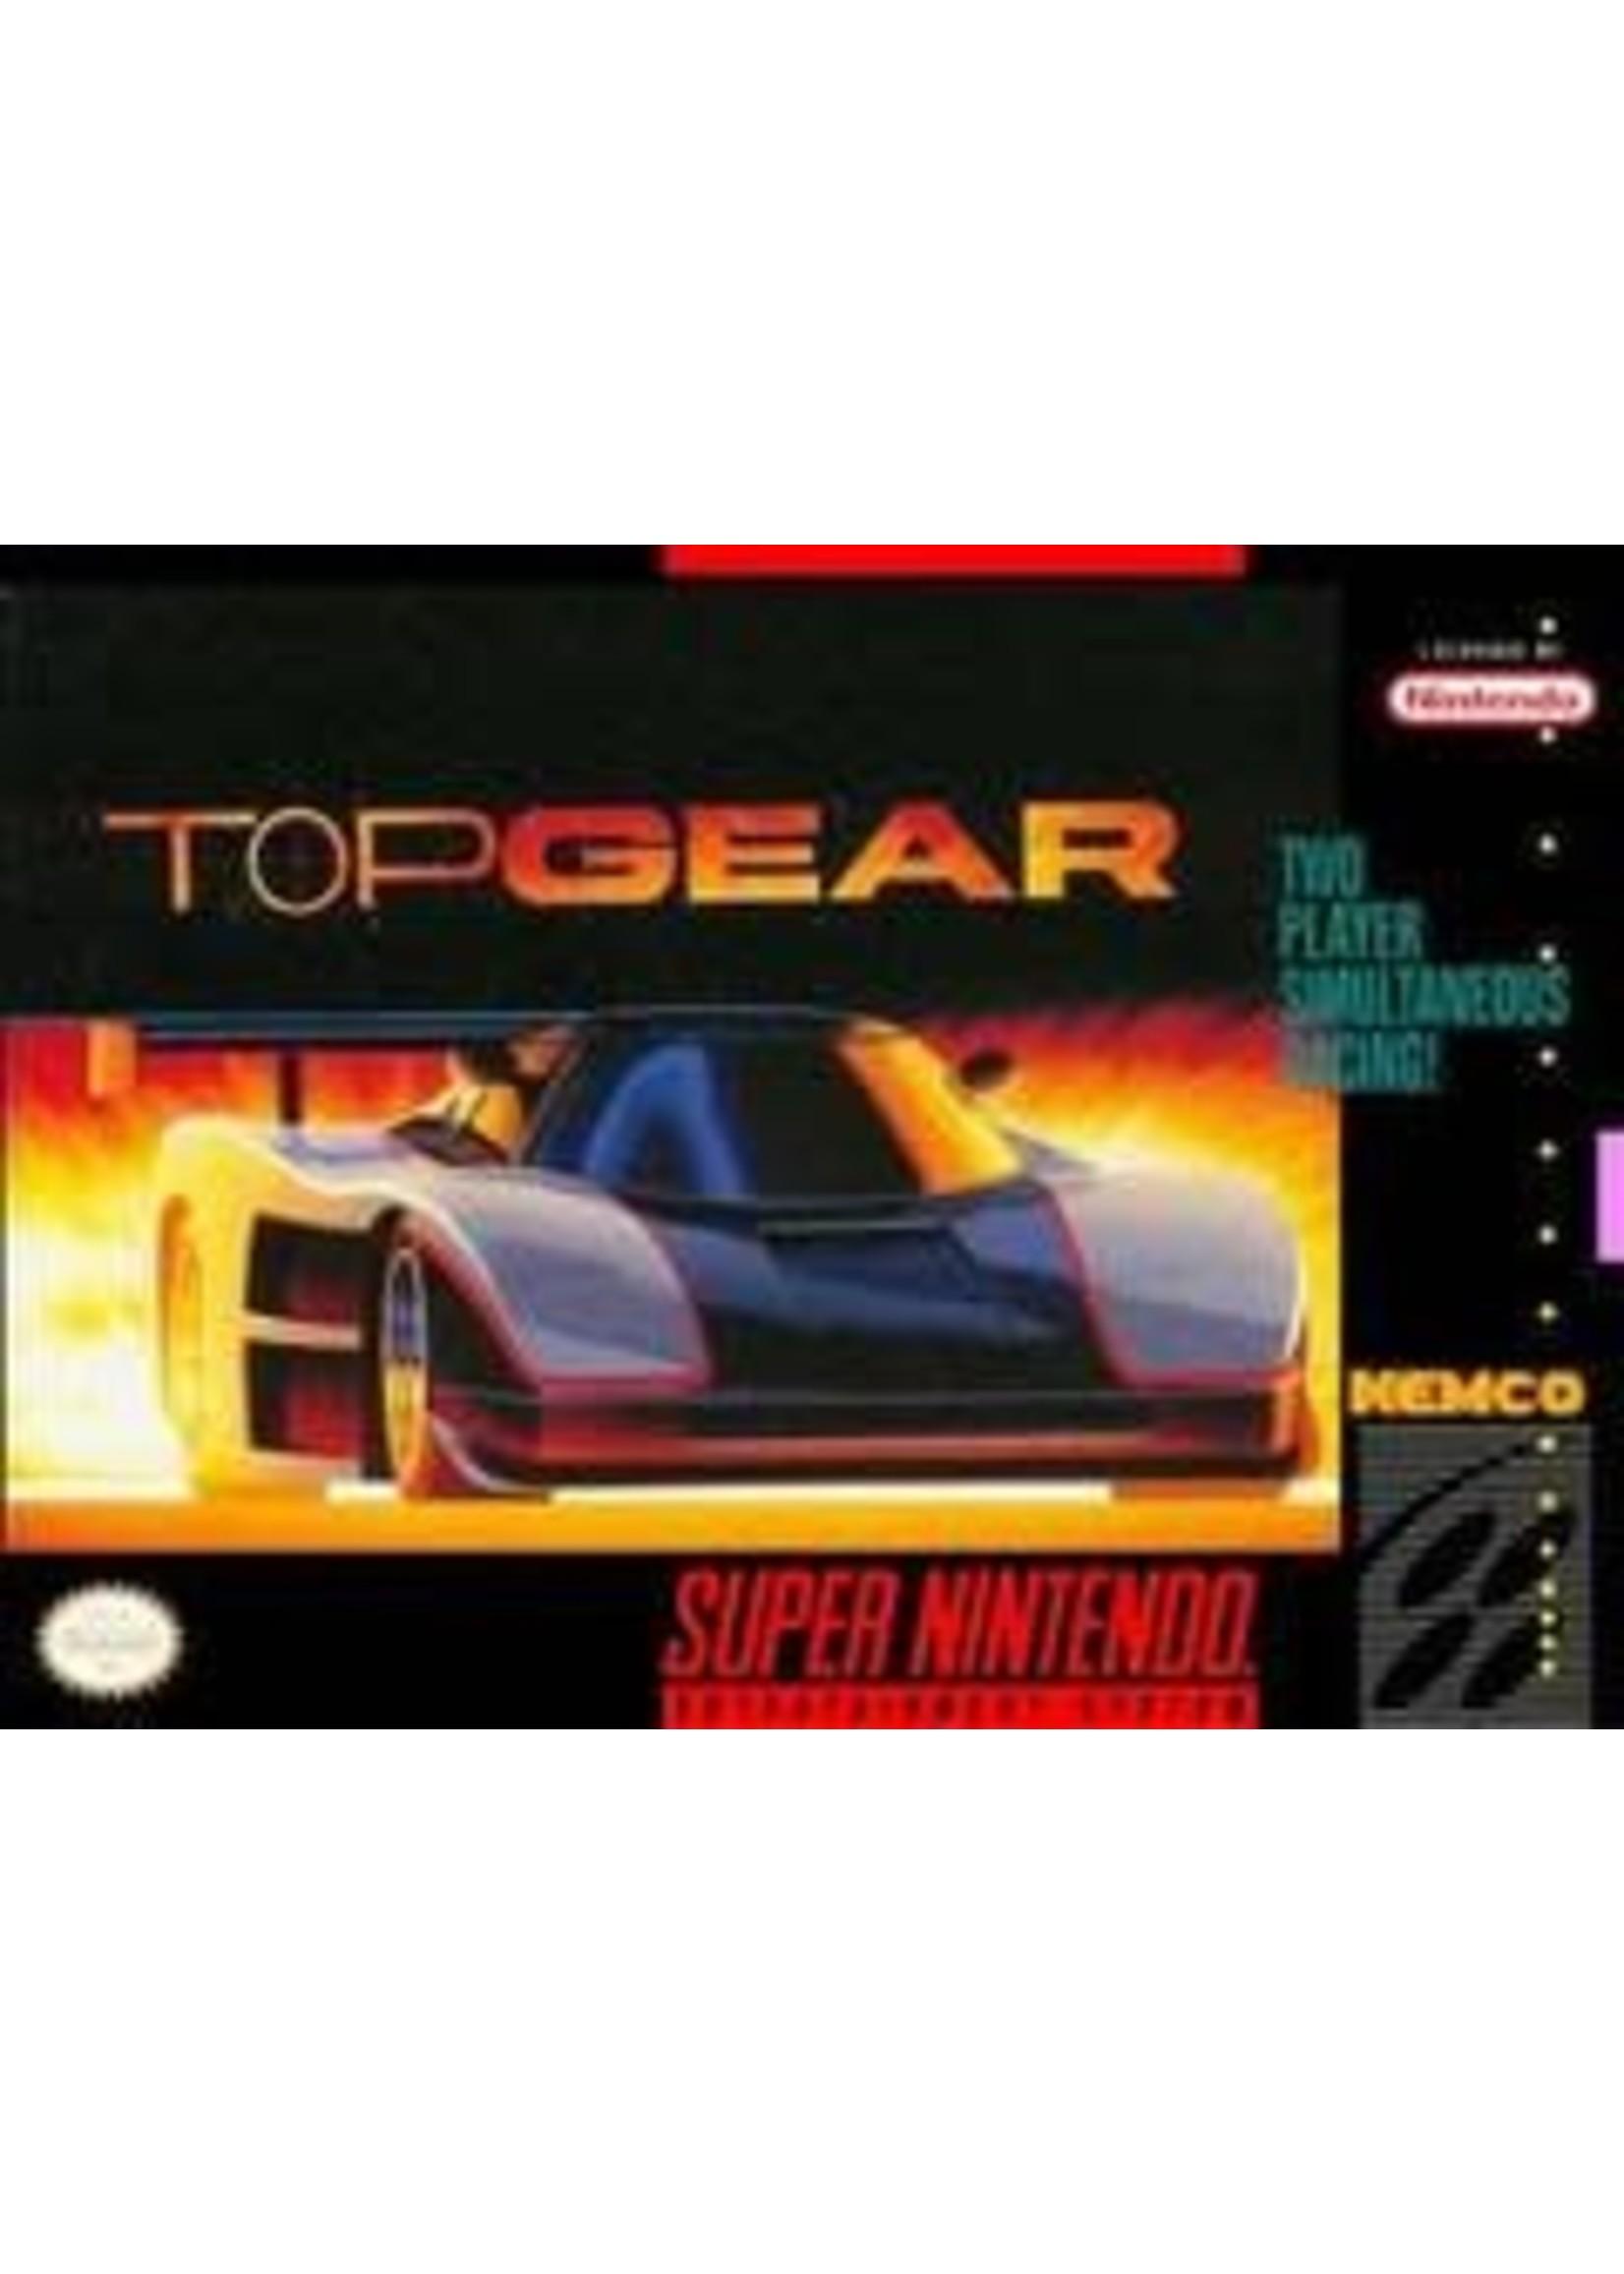 Top Gear Super Nintendo